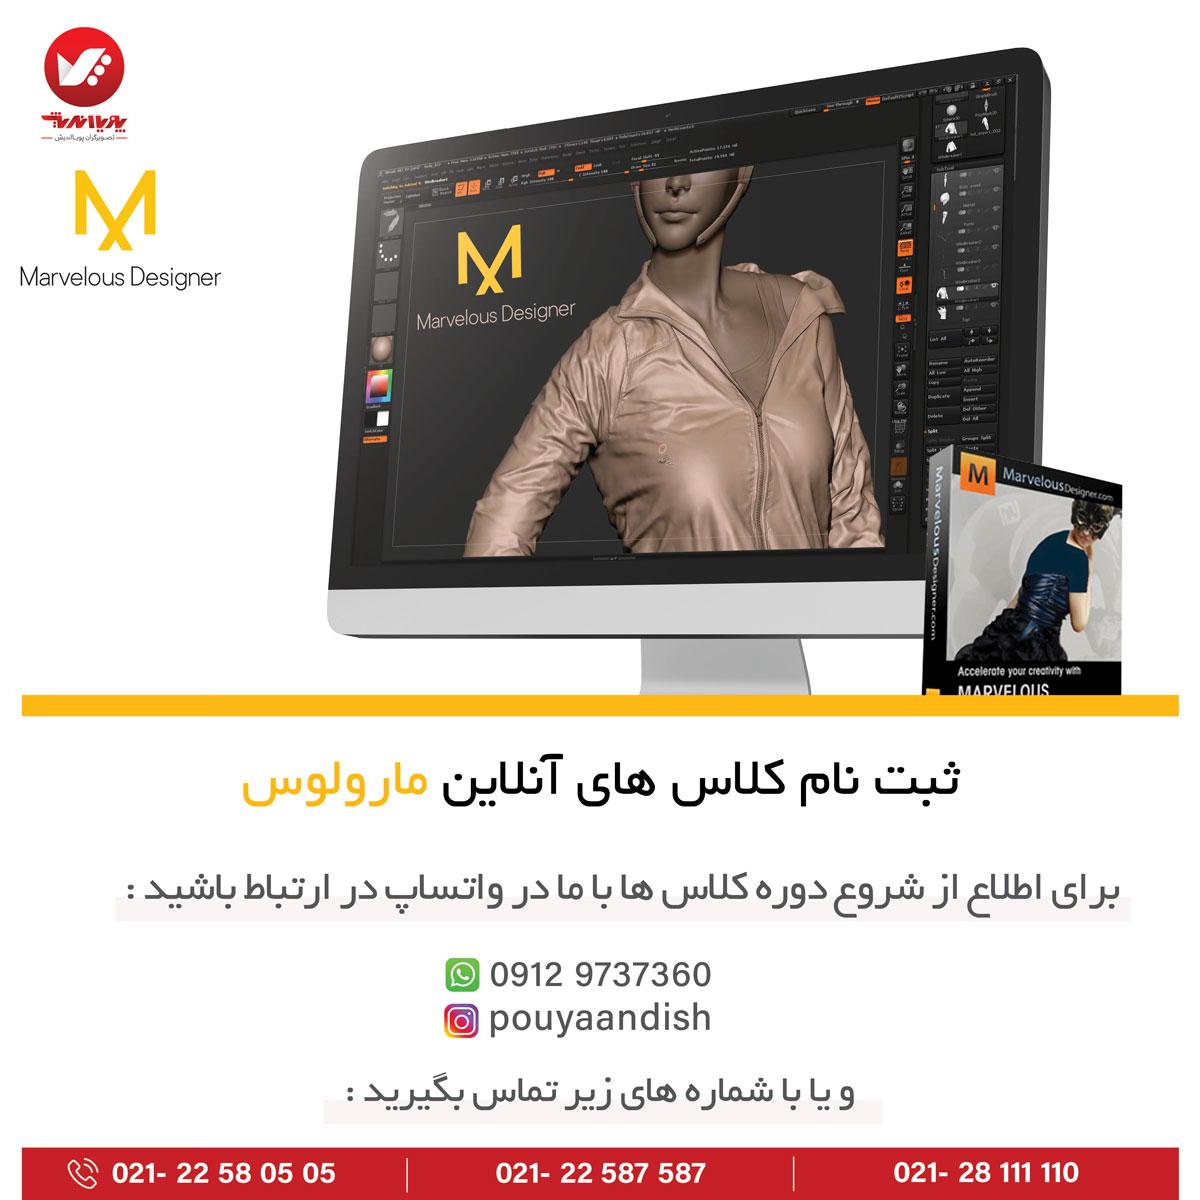 marvelus sabtenam - آموزش آنلاین و مجازی مارولوس   دوره غیرحضوری و از راه دور Marvelous